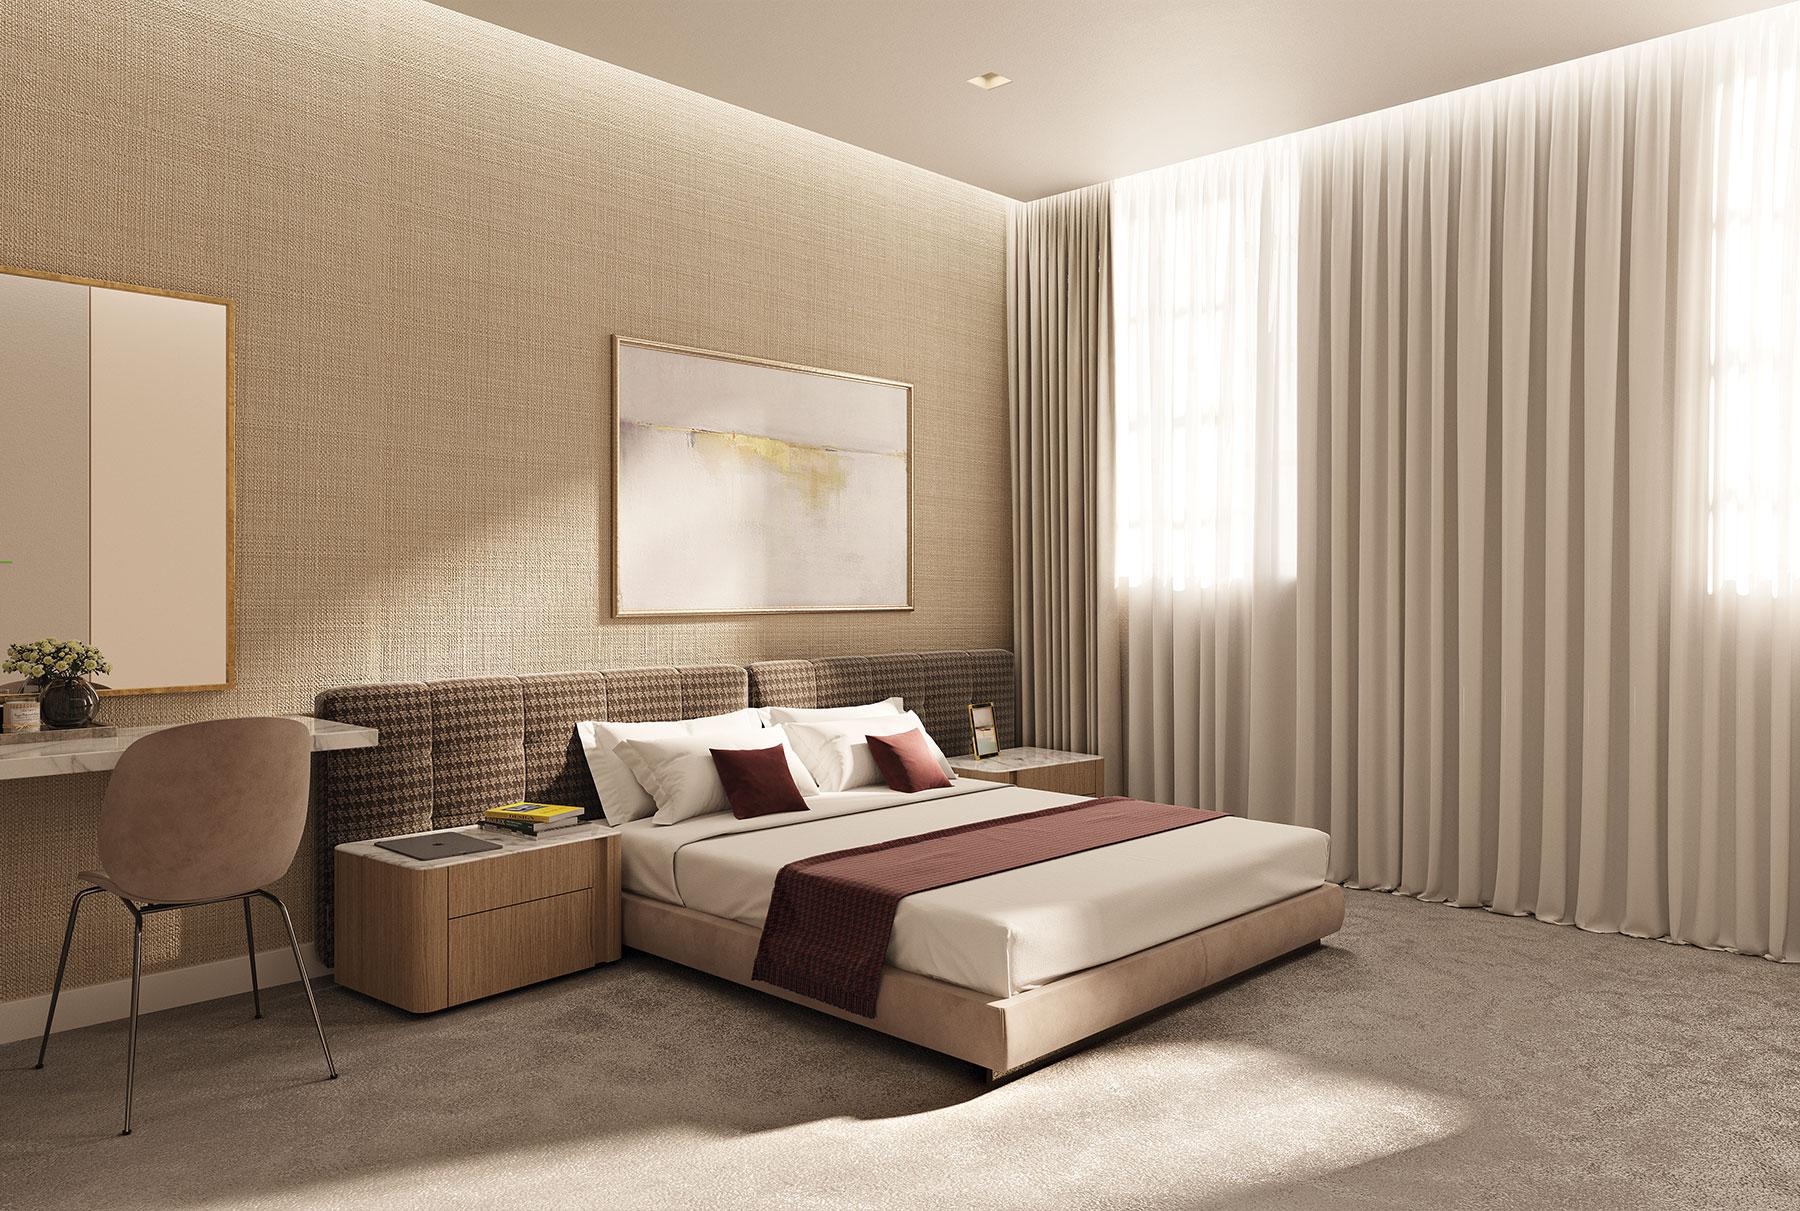 Lavish Bedroom Spaces